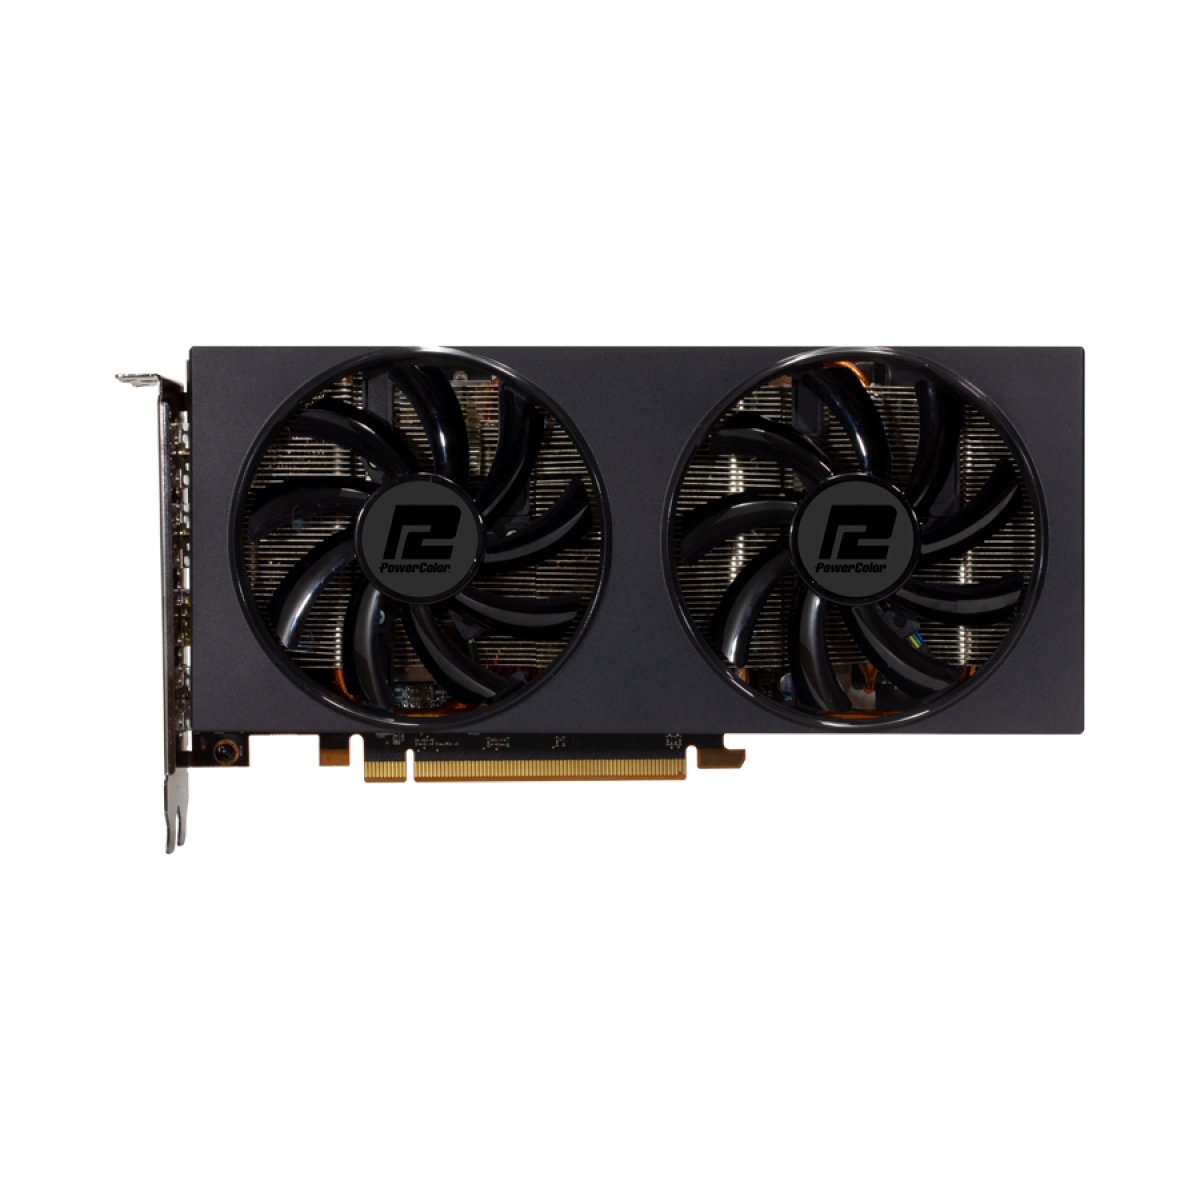 Placa de Vídeo PowerColor, Radeon, Navi RX 5700 XT DUAL OC, 8GB, GDDR6, 256Bit, AXRX 5700 XT 8GBD6-3DH